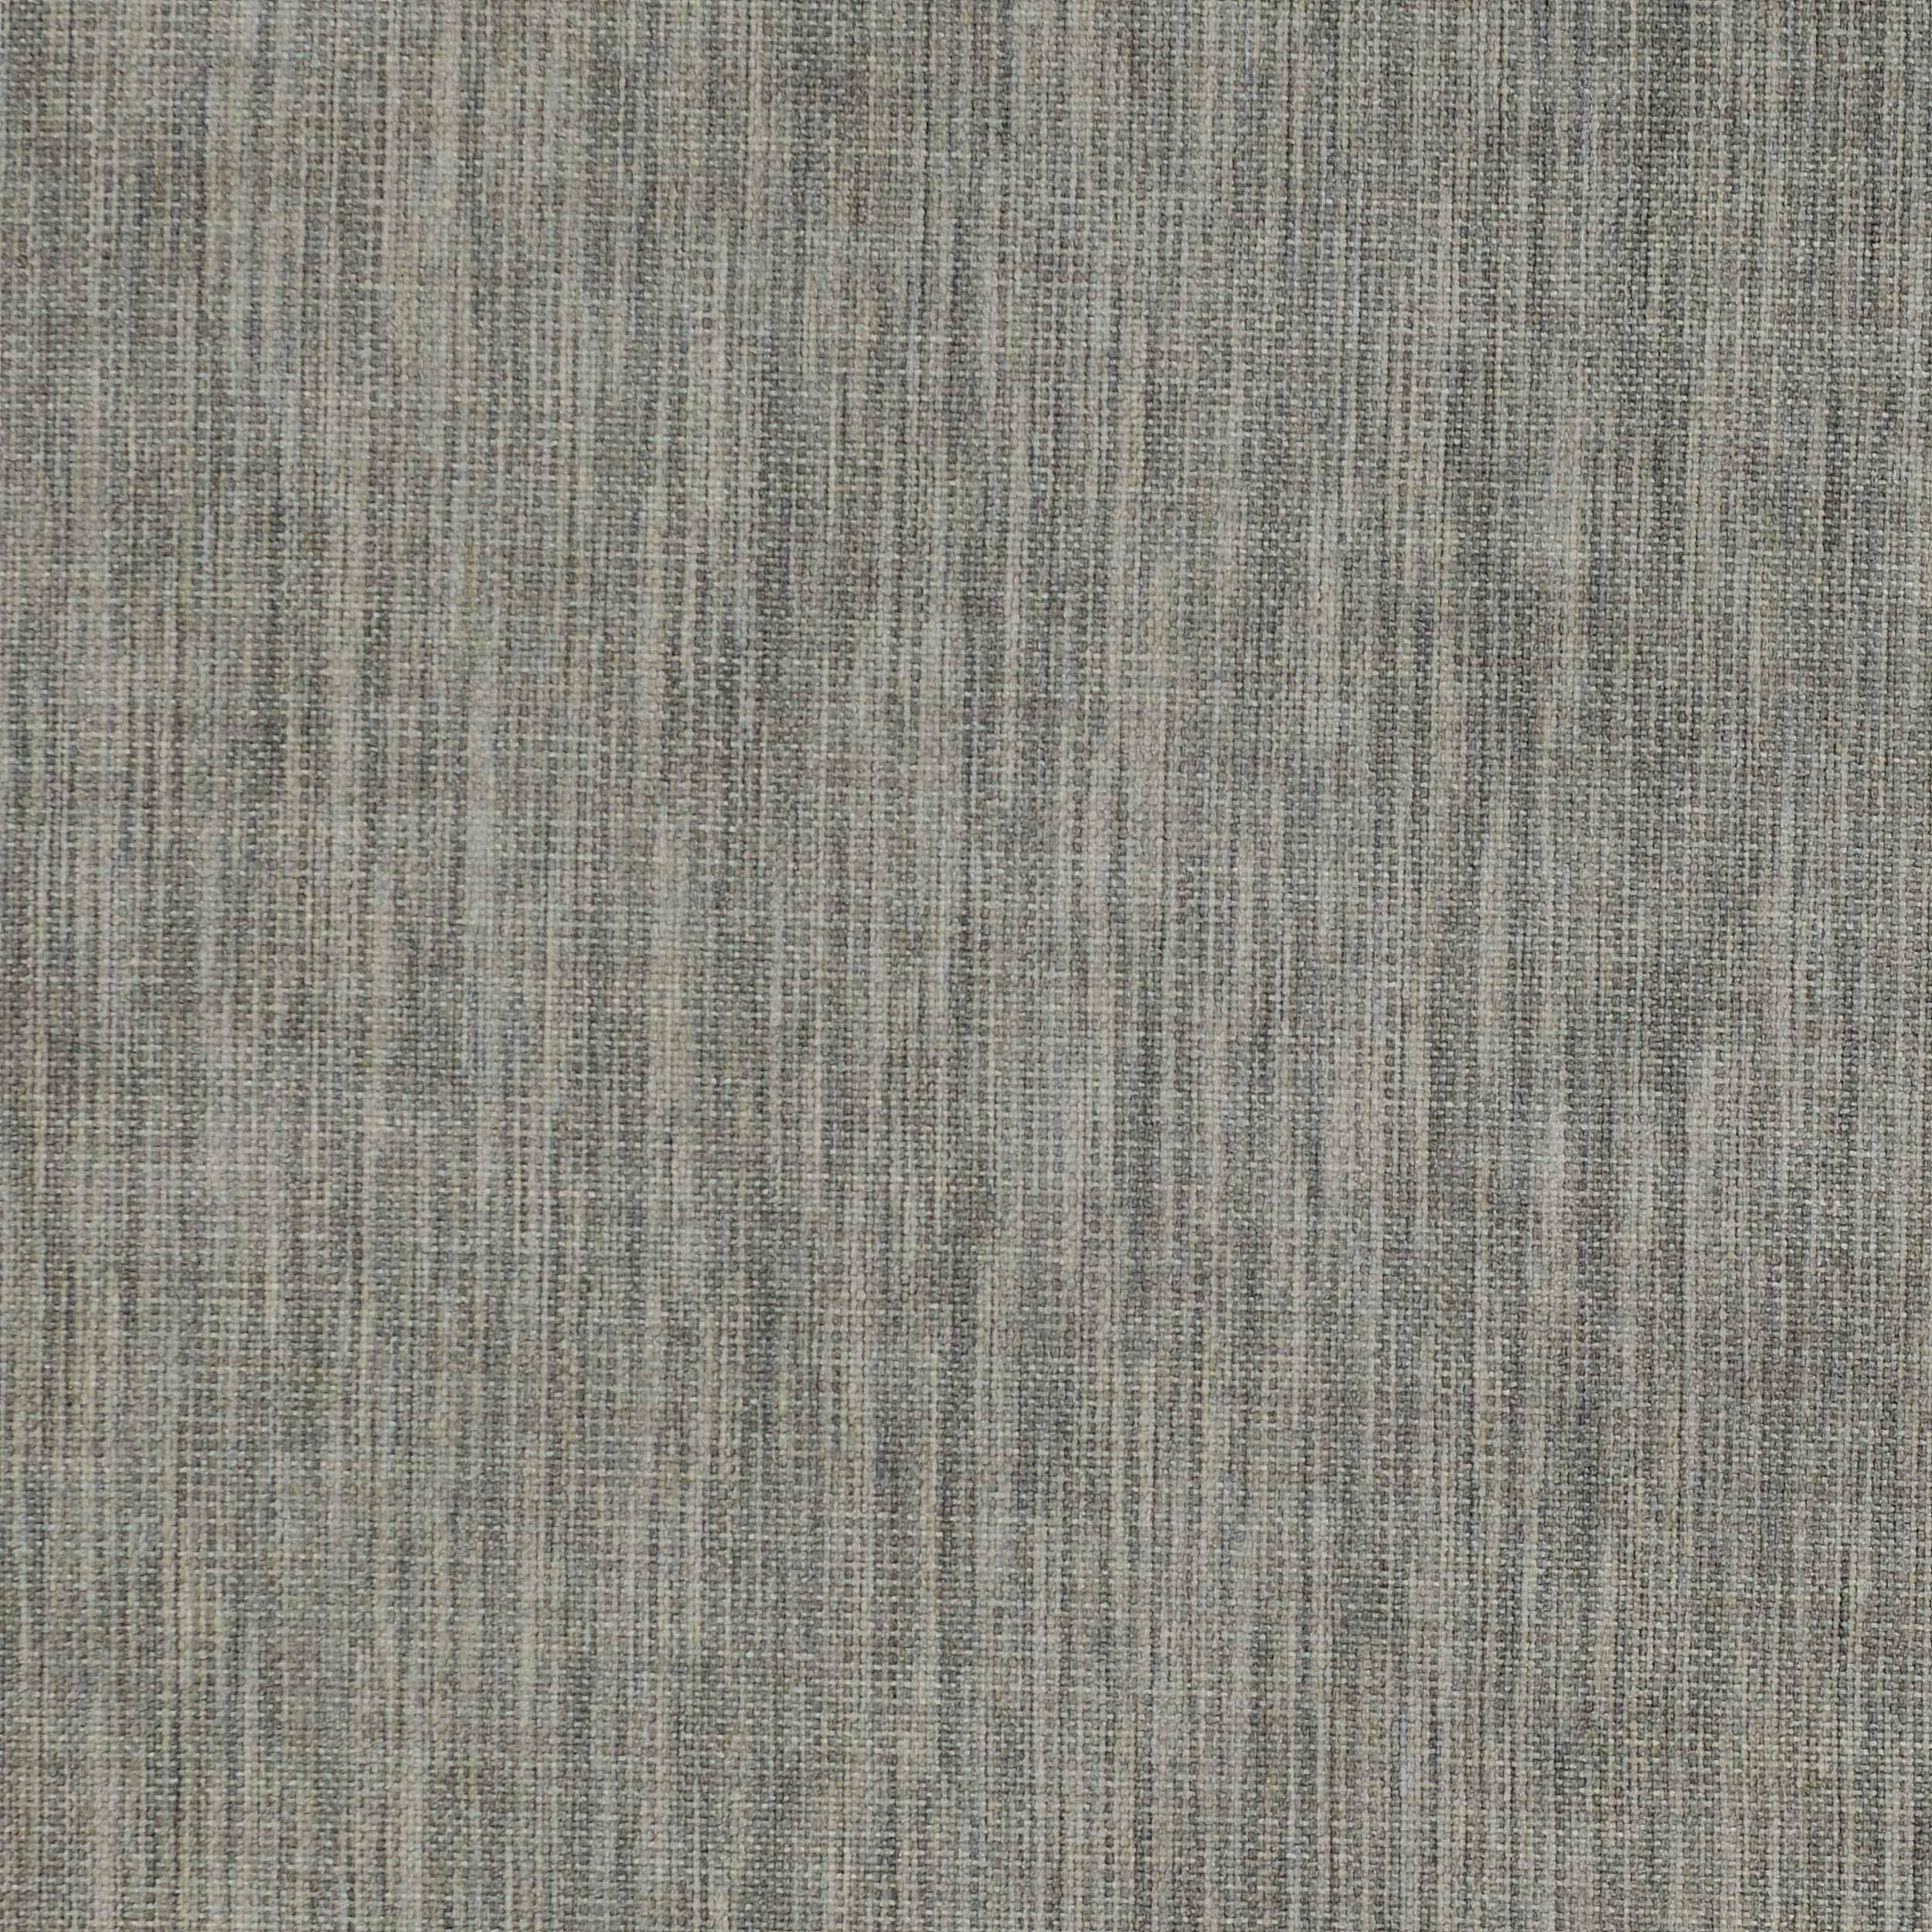 tissu rufus tissus par diteur larsen le boudoir des. Black Bedroom Furniture Sets. Home Design Ideas